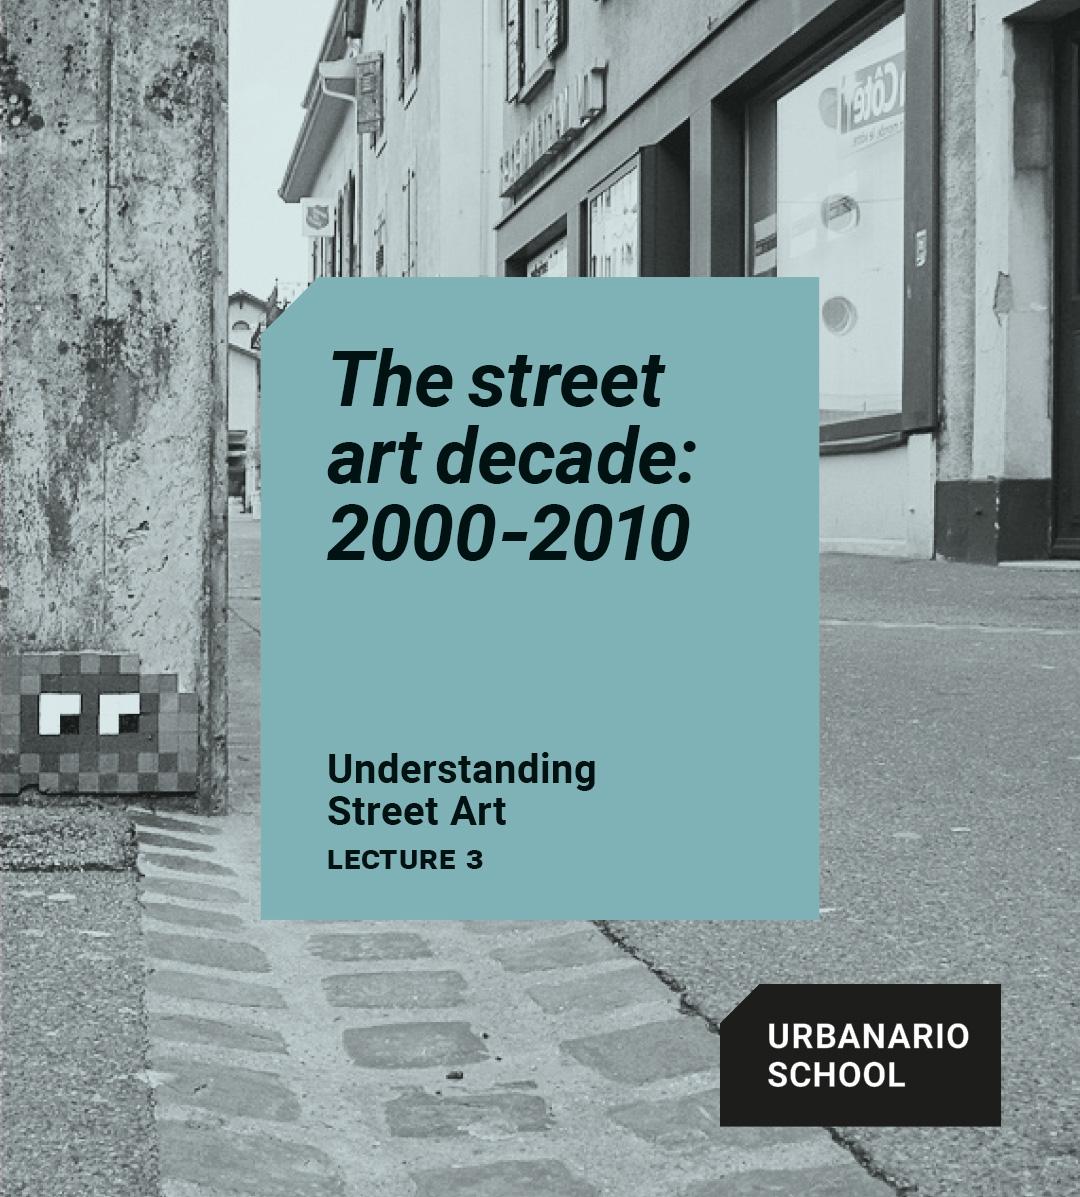 The street art decade: 2000-2010